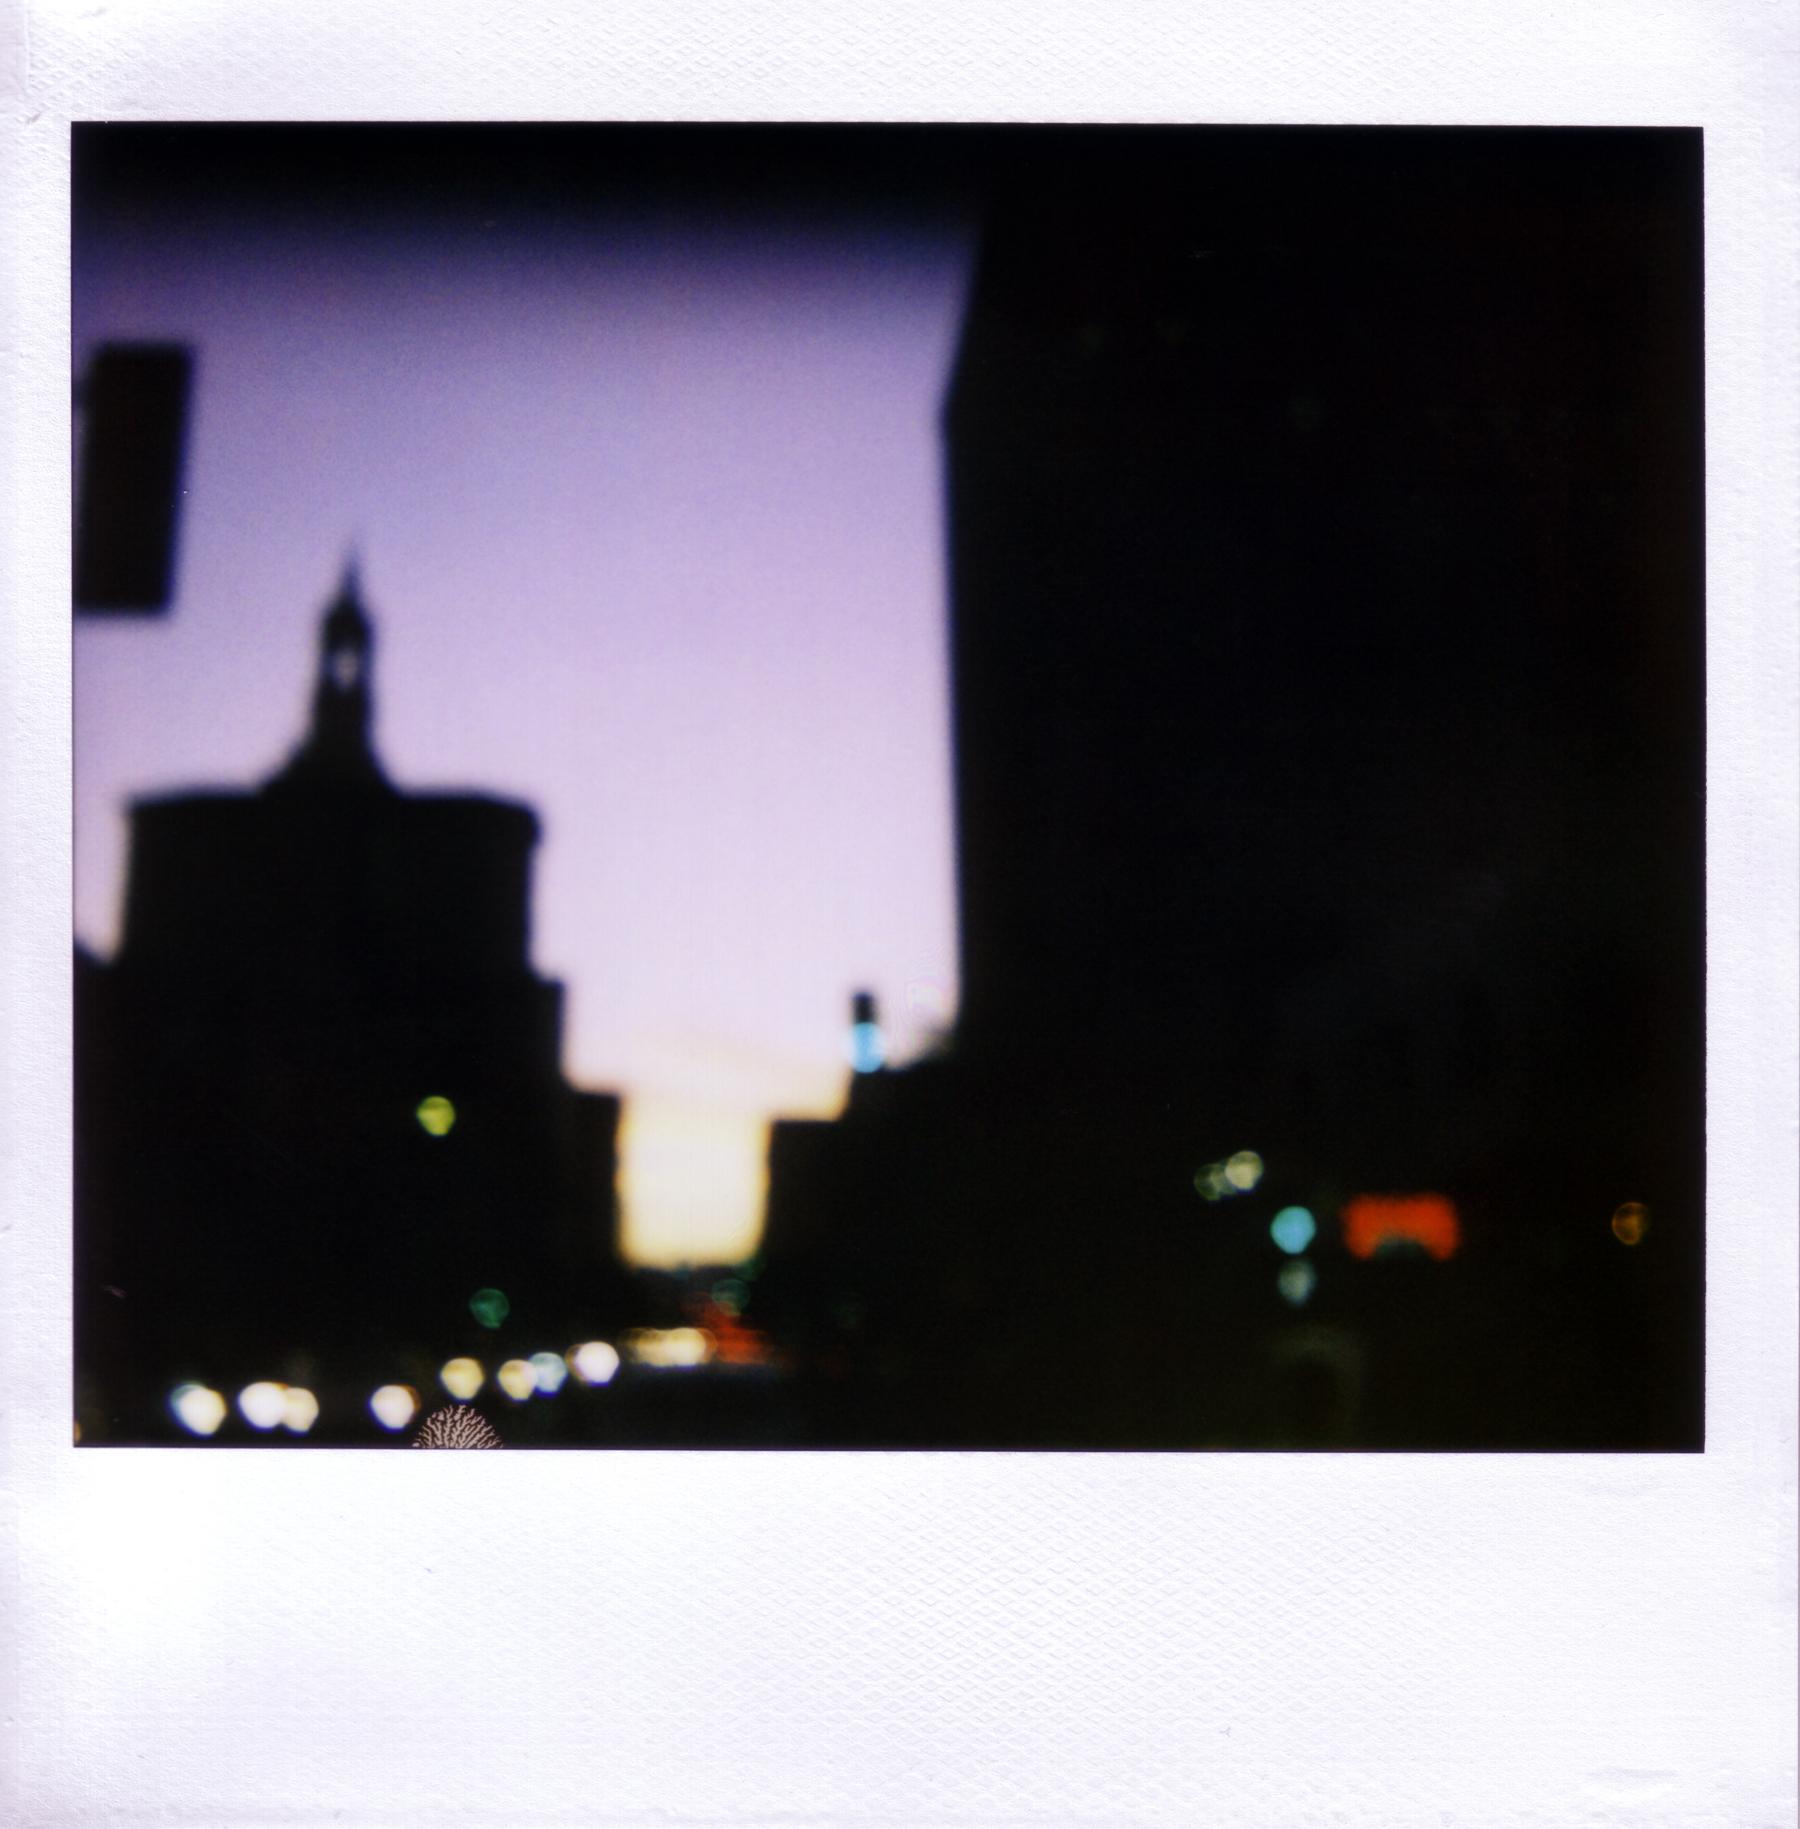 the5part | Polaroid Spectra | Polaroid Originals Spectra Color | Russ Morris